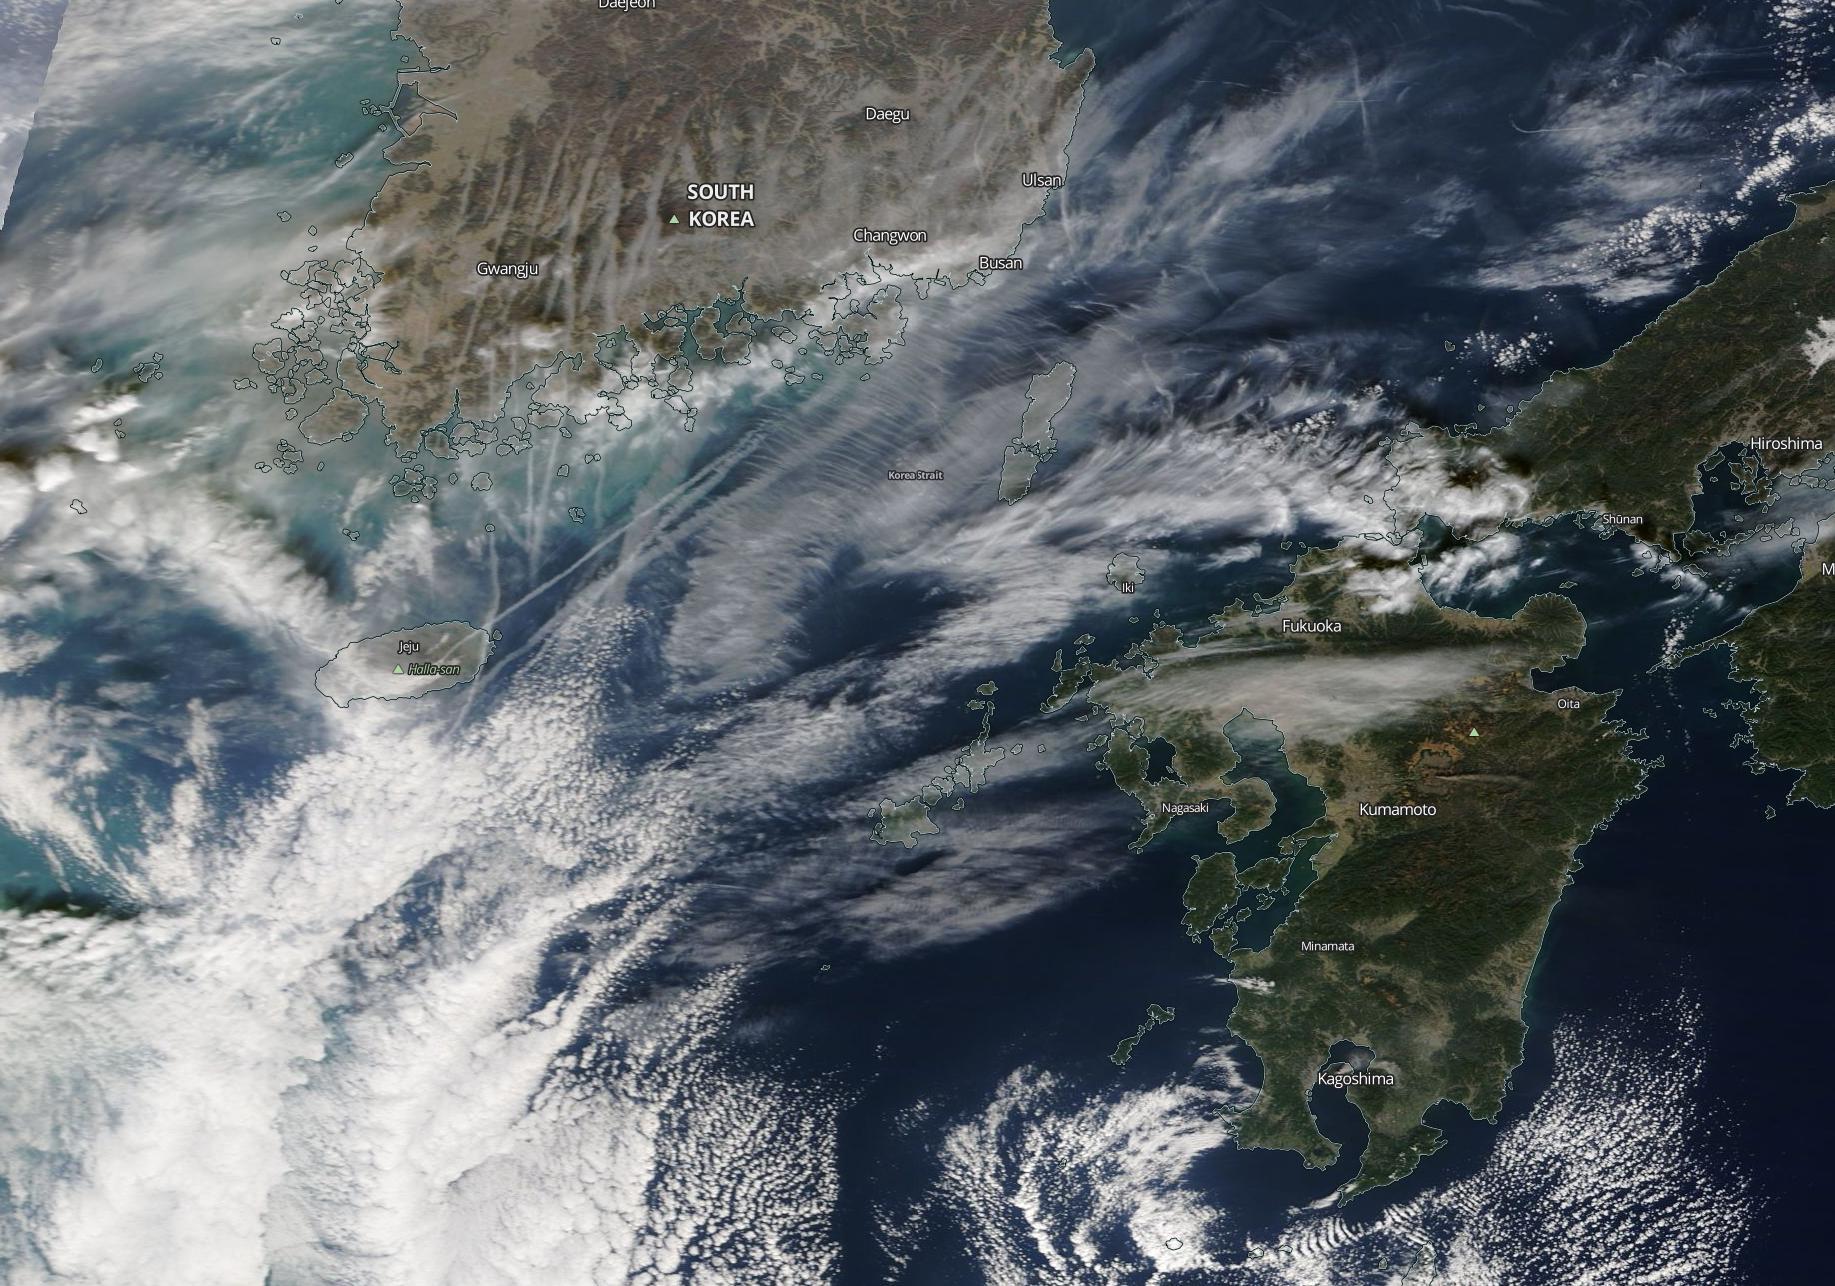 South Korea, Nagasaki, Busan, Ulsan, probable chemtrail geoengineering. Friday 13th Dec 2019. https://go.nasa.gov/2PILEEc